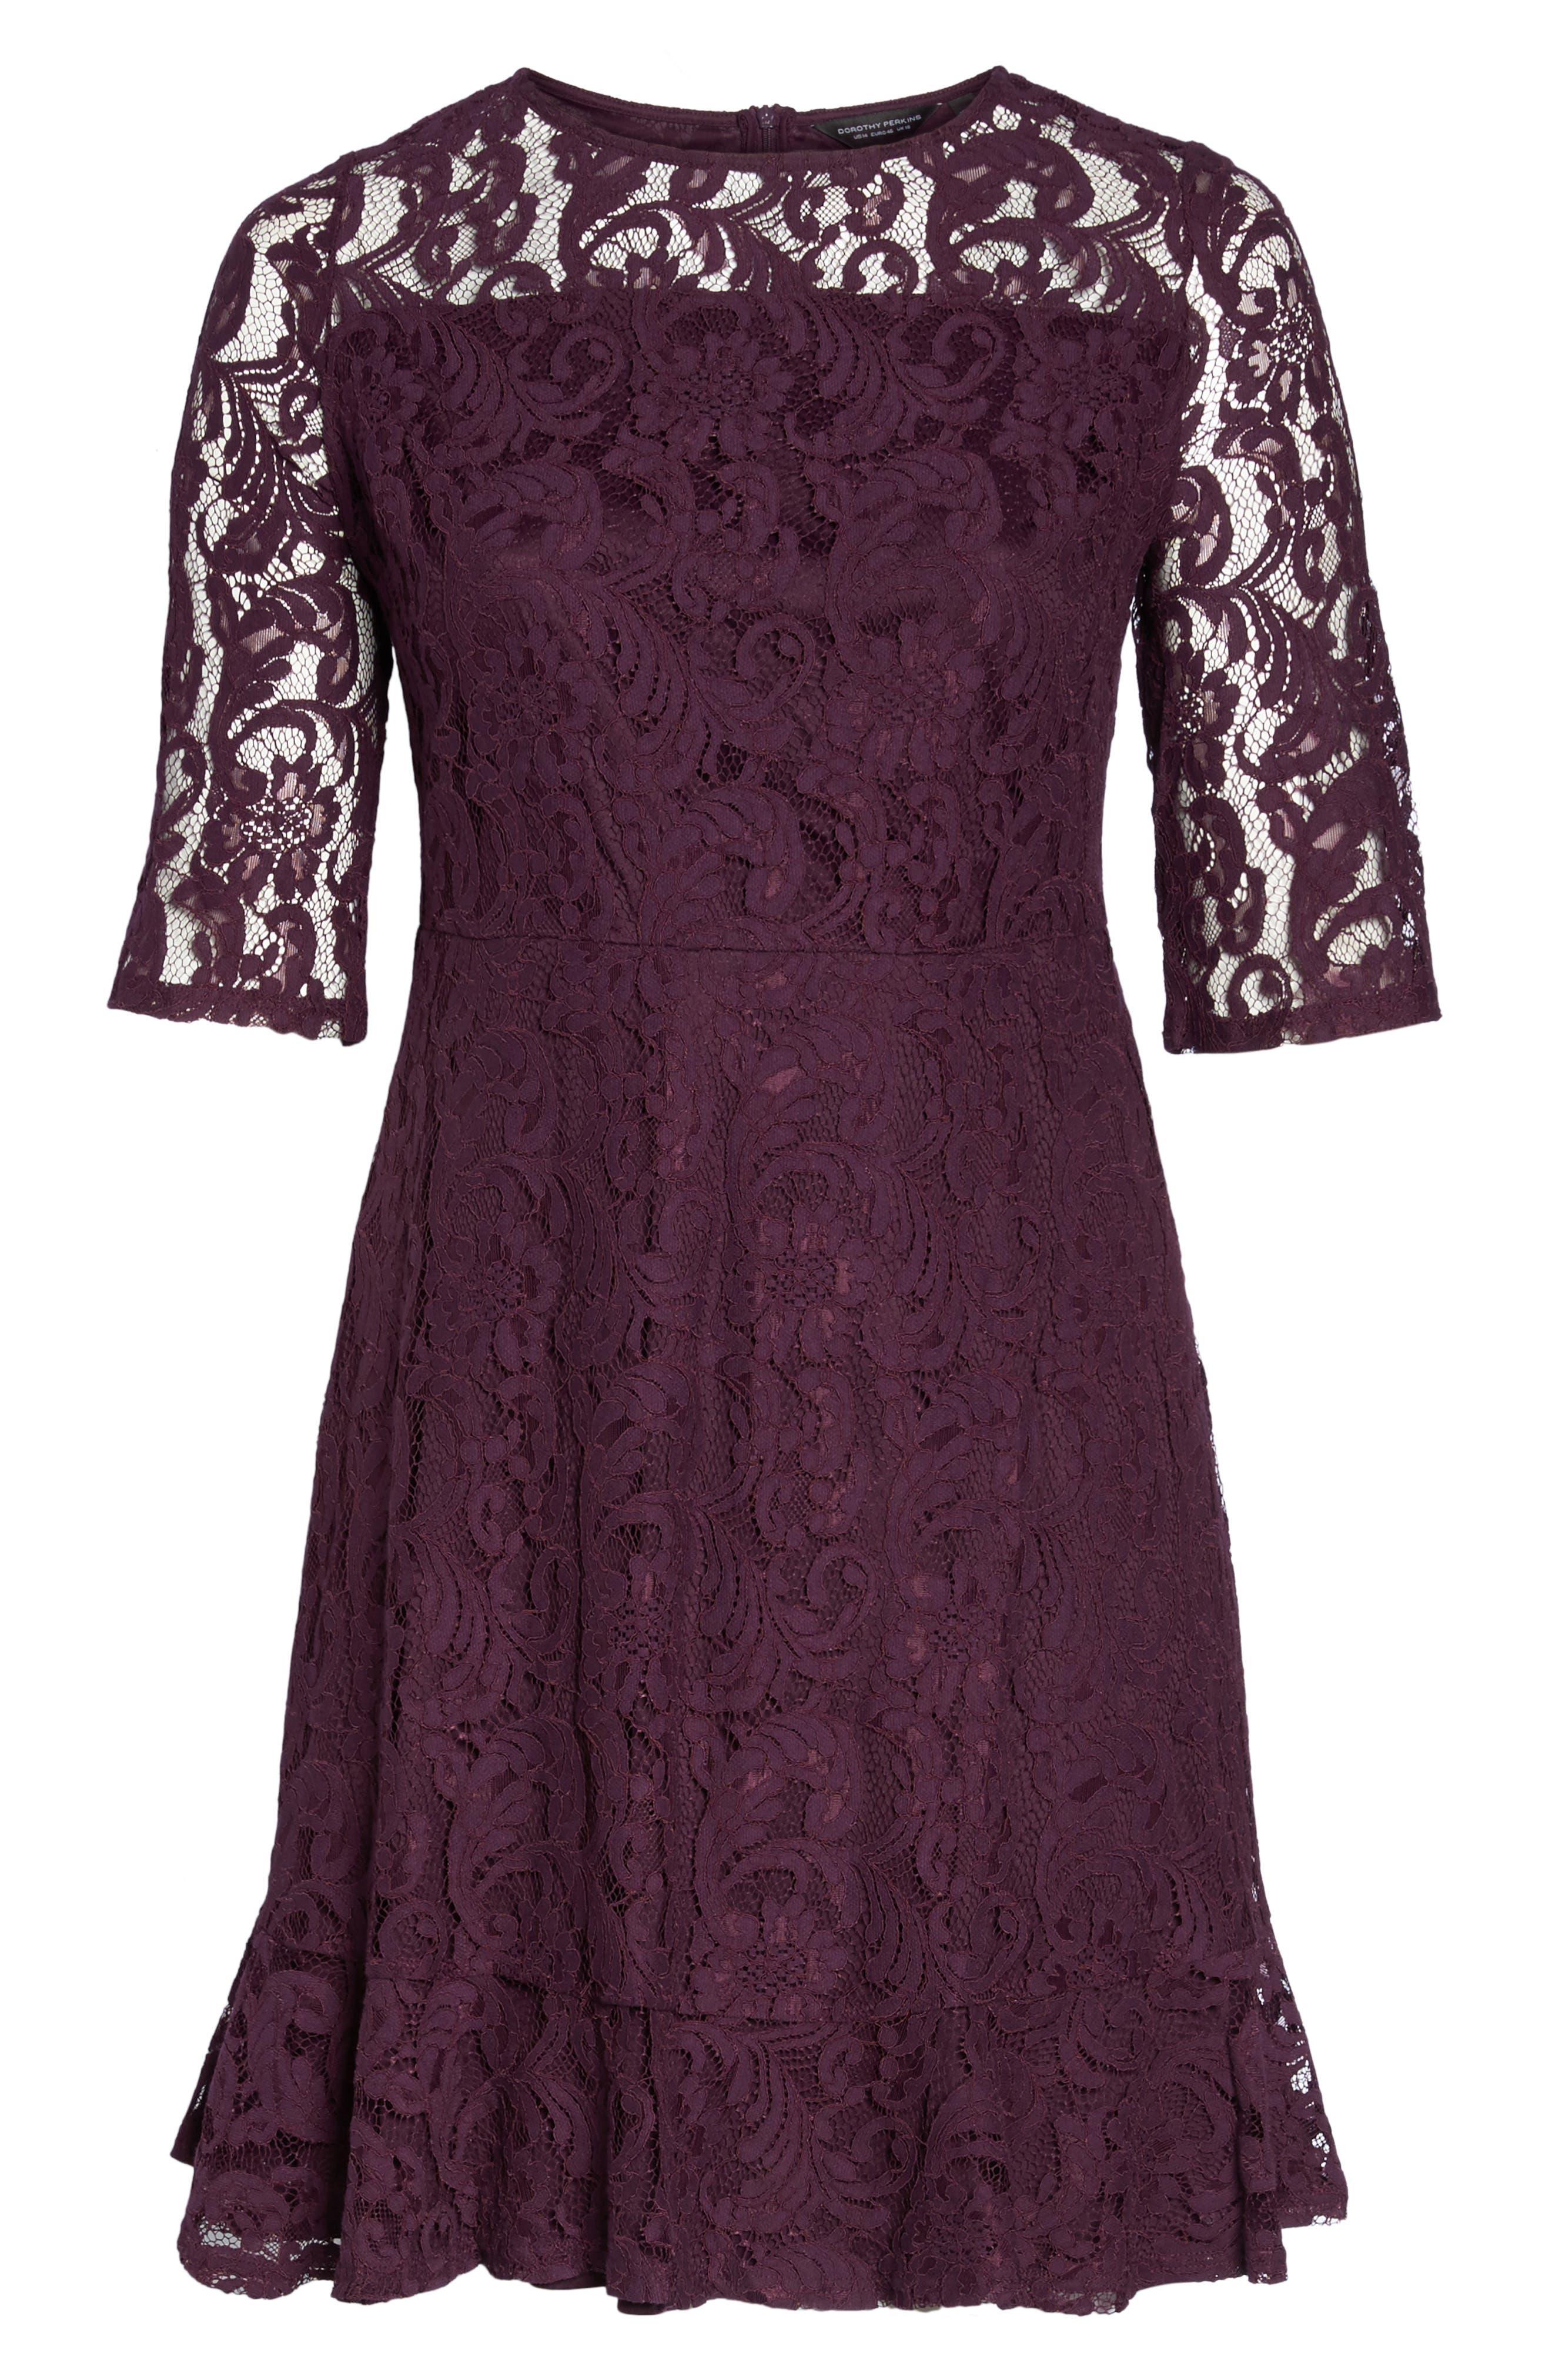 Lace Fit & Flare Dress,                             Alternate thumbnail 6, color,                             Burgundy